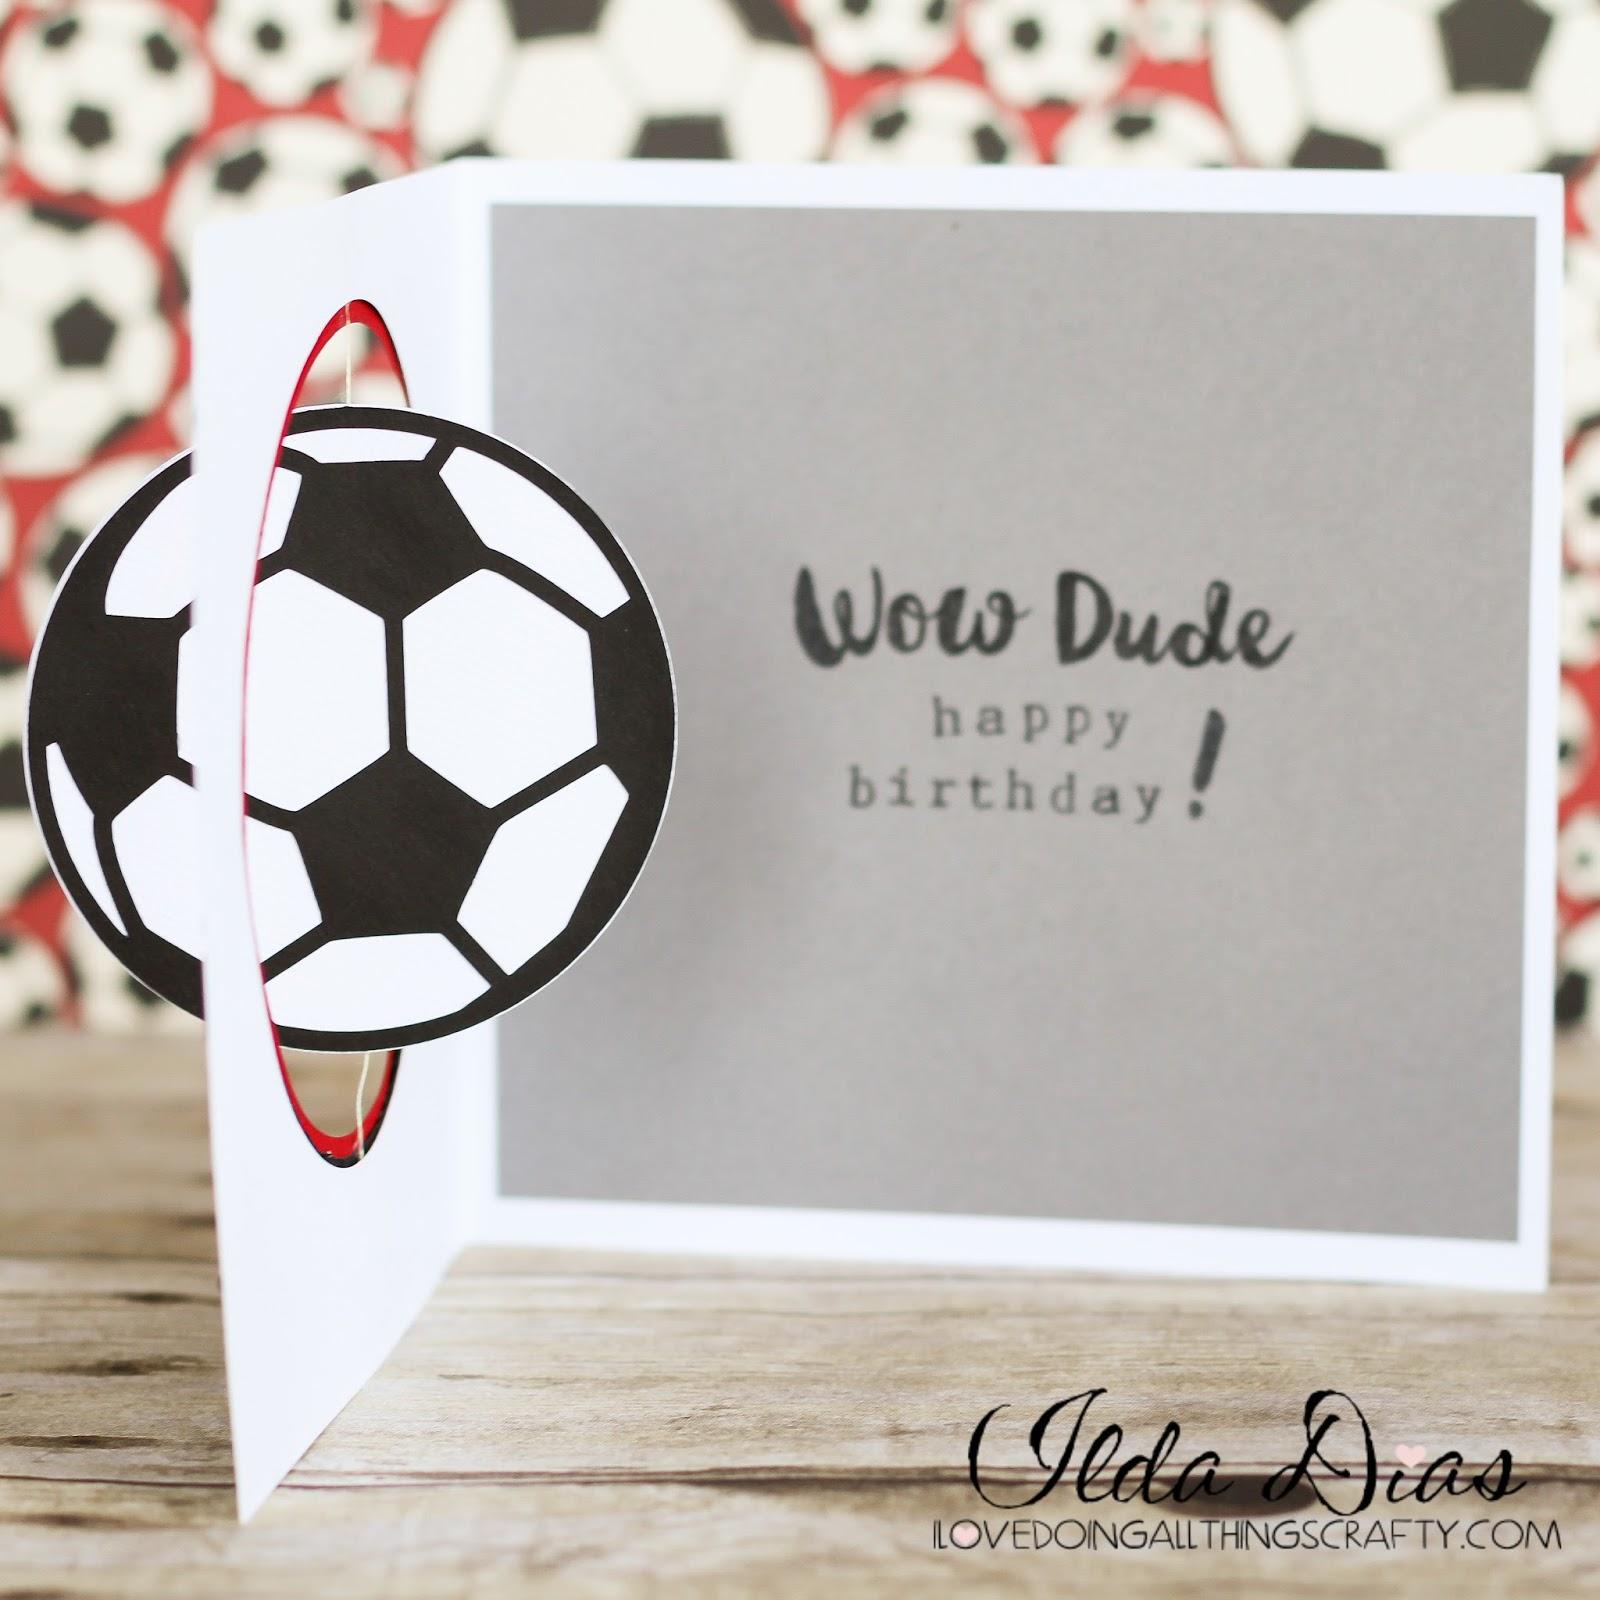 Soccer ball card juvecenitdelacabrera soccer ball card m4hsunfo